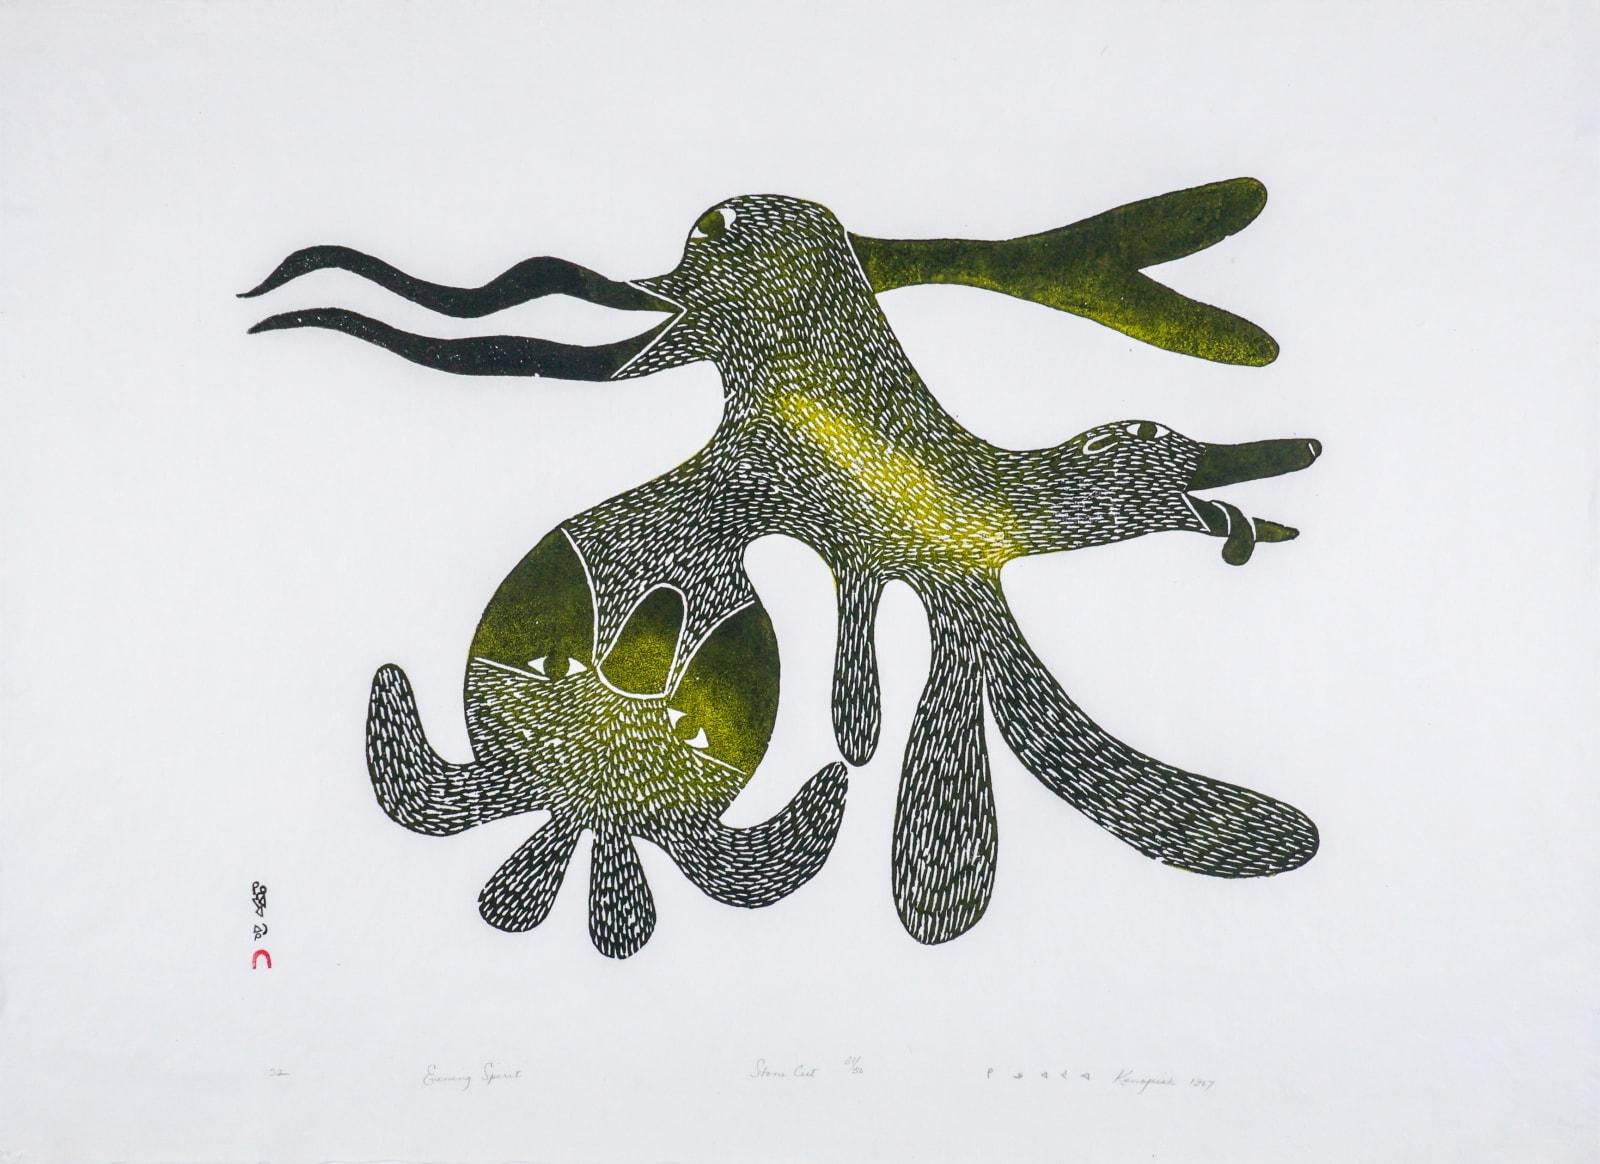 Lot 42 KENOJUAK ASHEVAK, C.C., R.C.A. (1927-2013) KINNGAIT (CAPE DORSET) Evening Spirit, 1967 stonecut, 24 1/2 x 34 in (62.2 x 86.4 cm) Estimate: $1,500 — $2,500